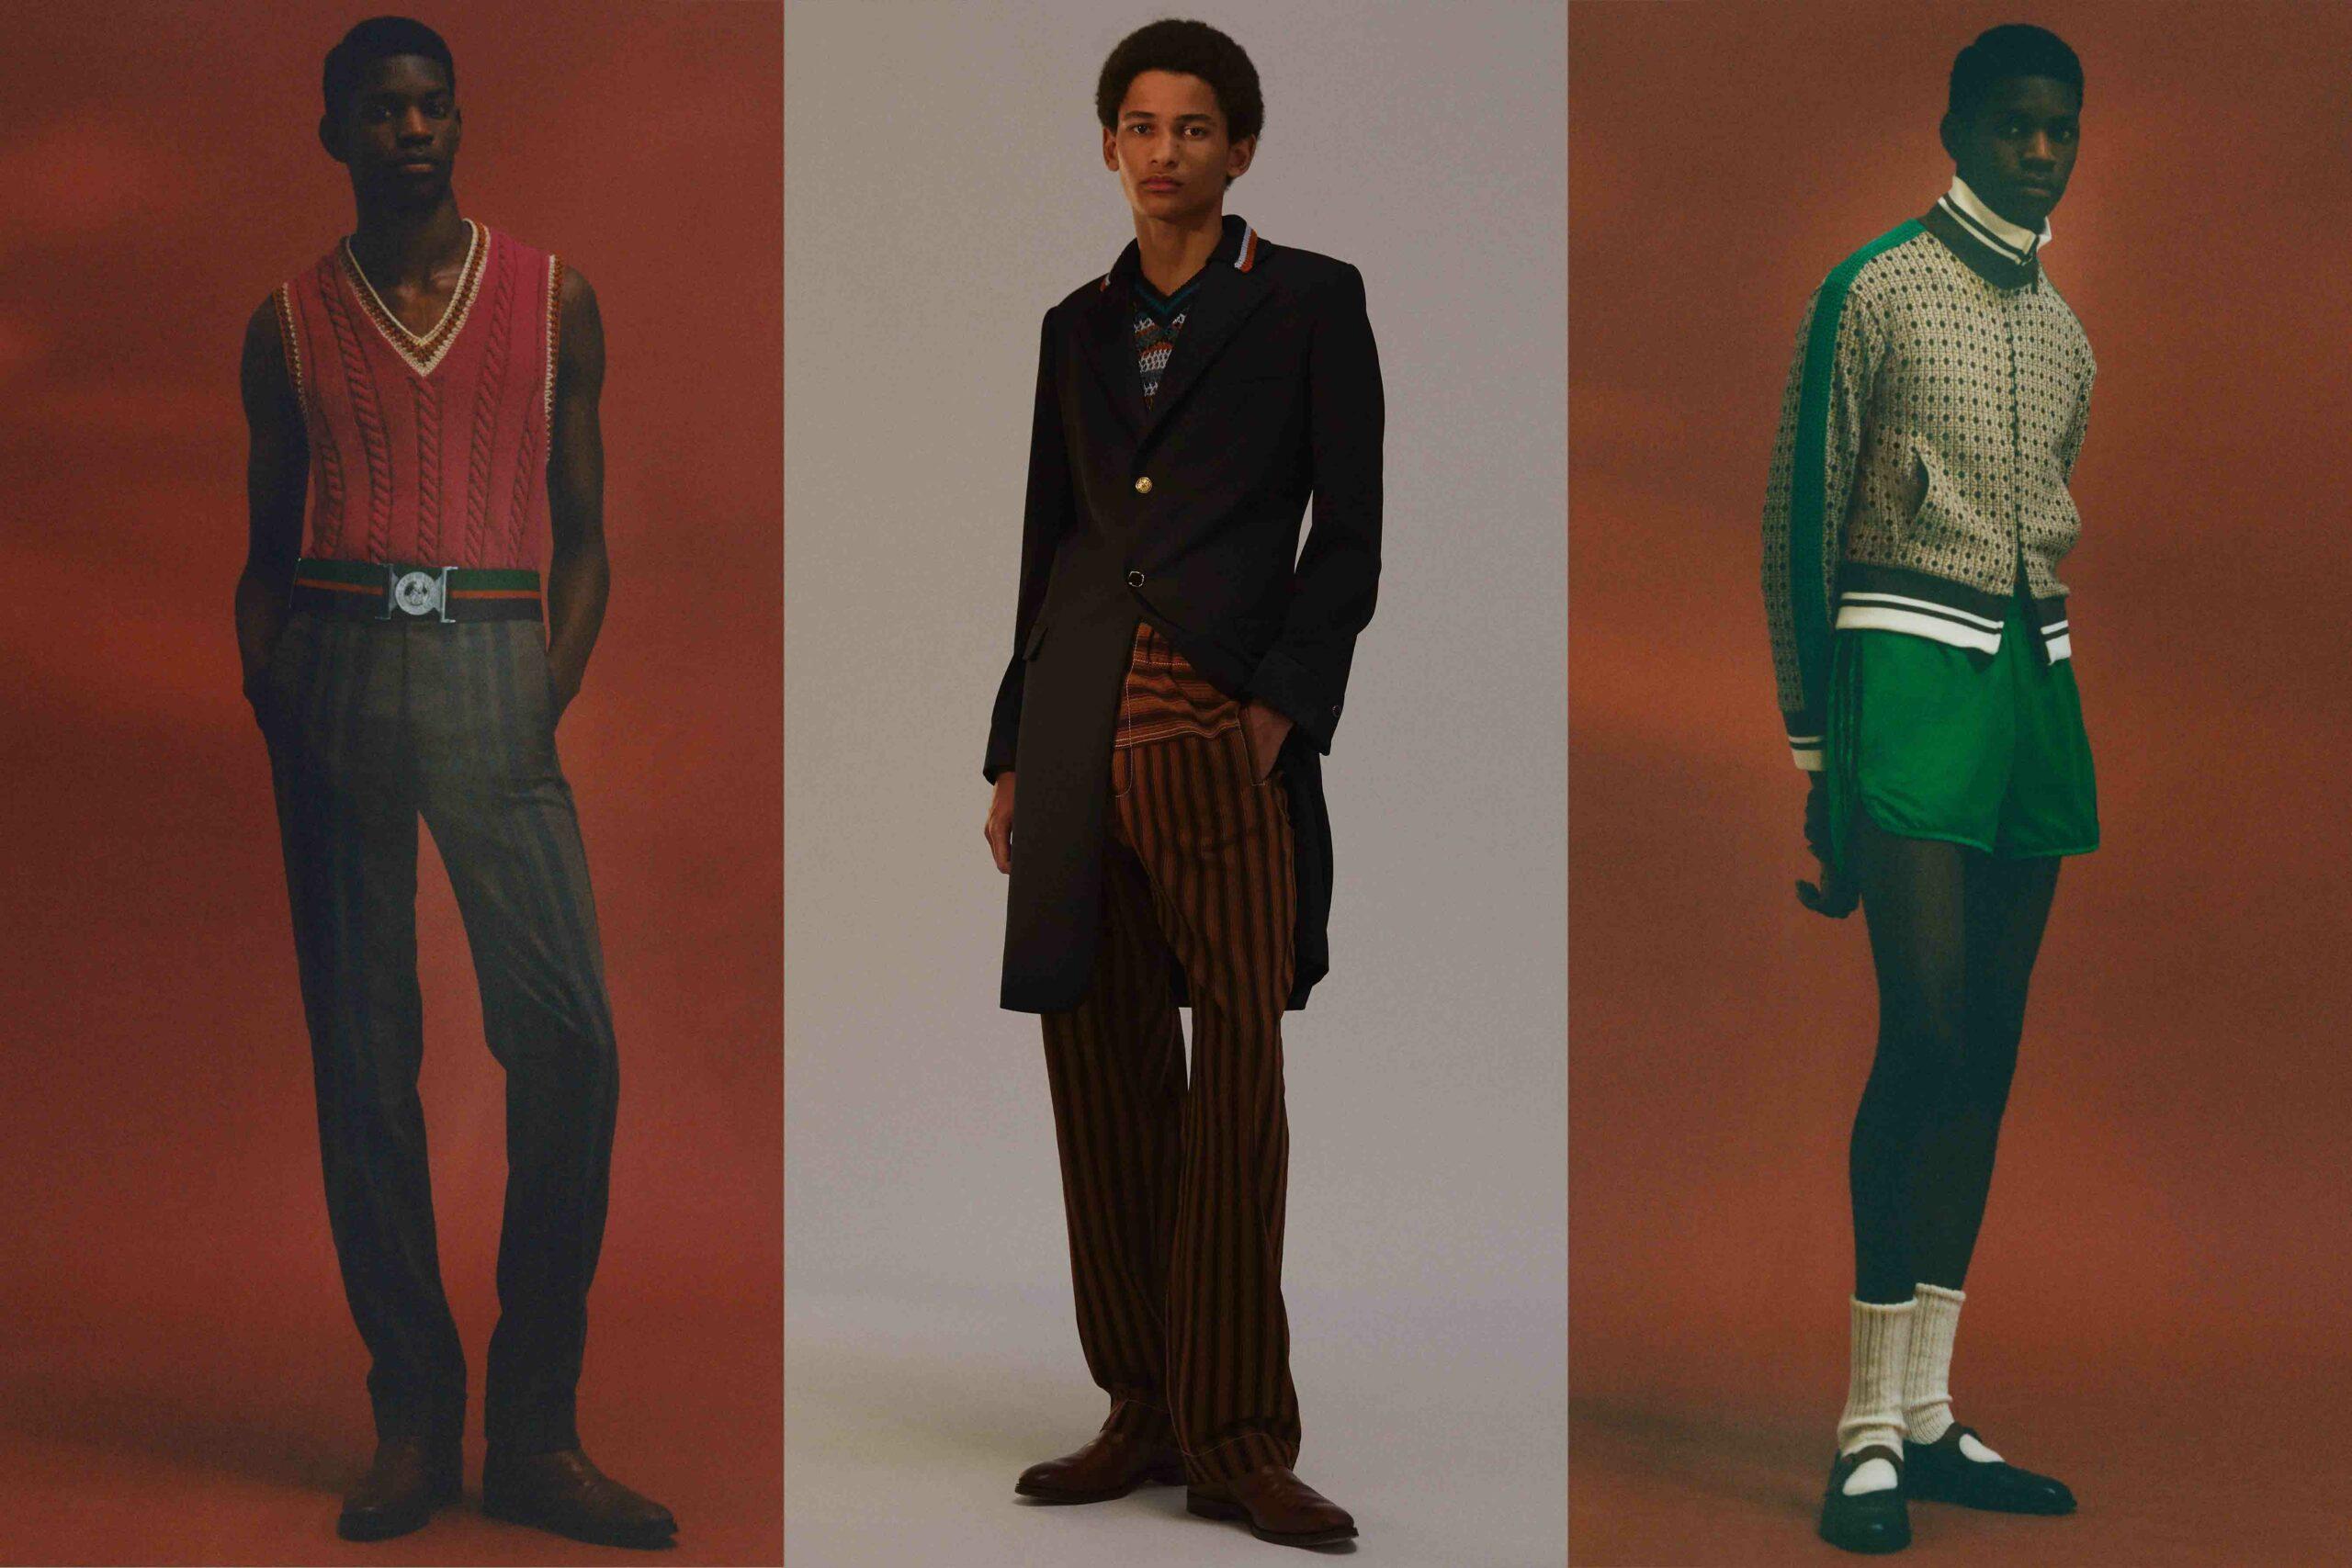 Rising Fashion Brands 2021: Wales Bonner